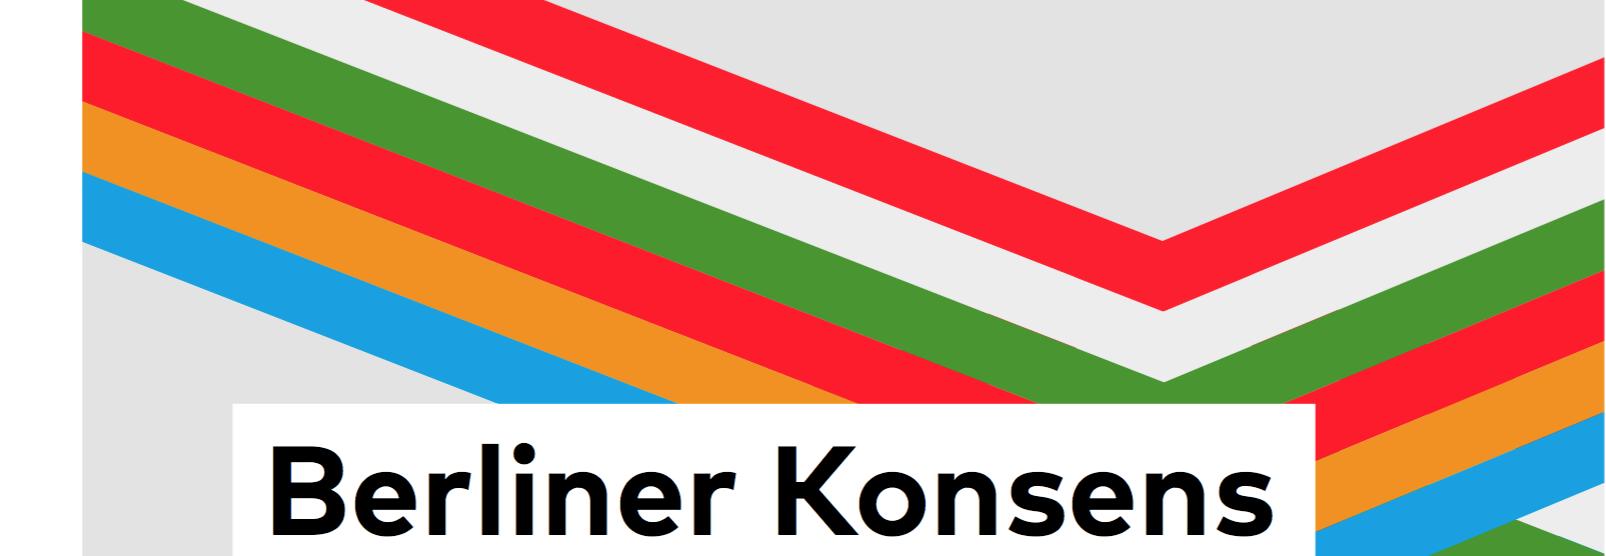 BerlinerKonsensHead.png